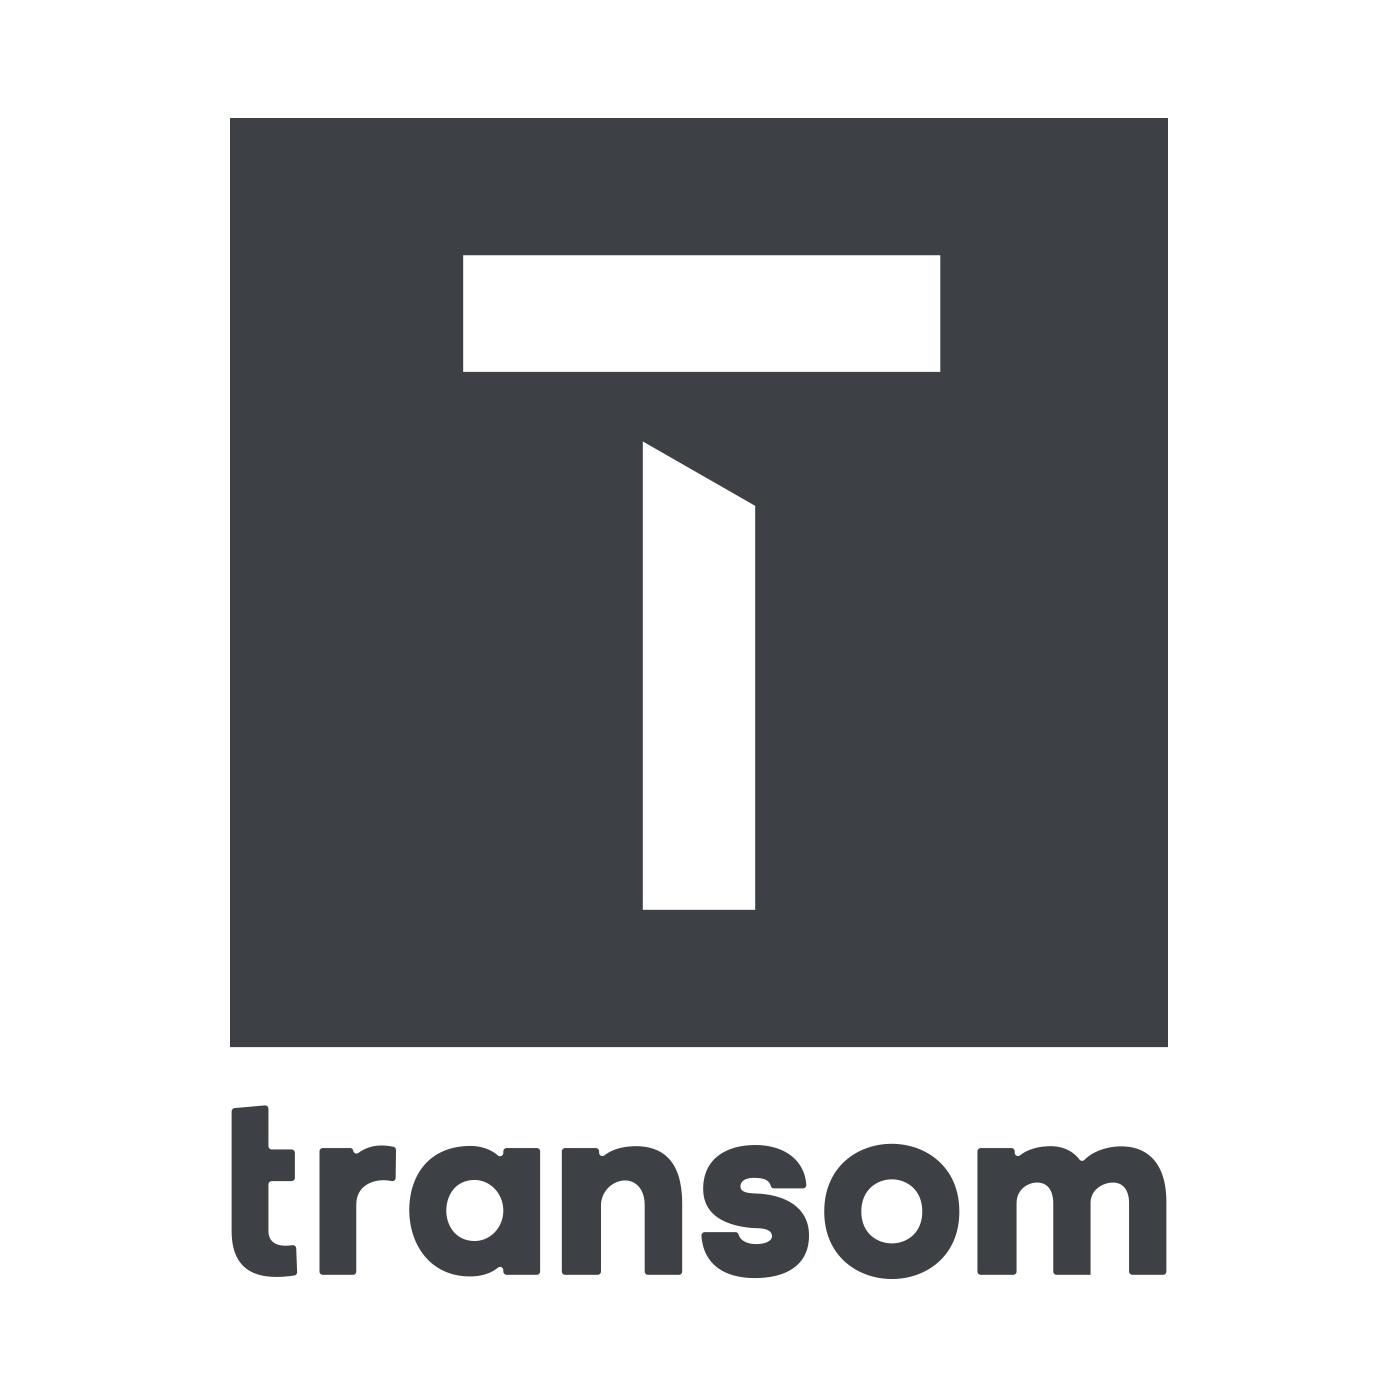 Transom Podcast podcast show image